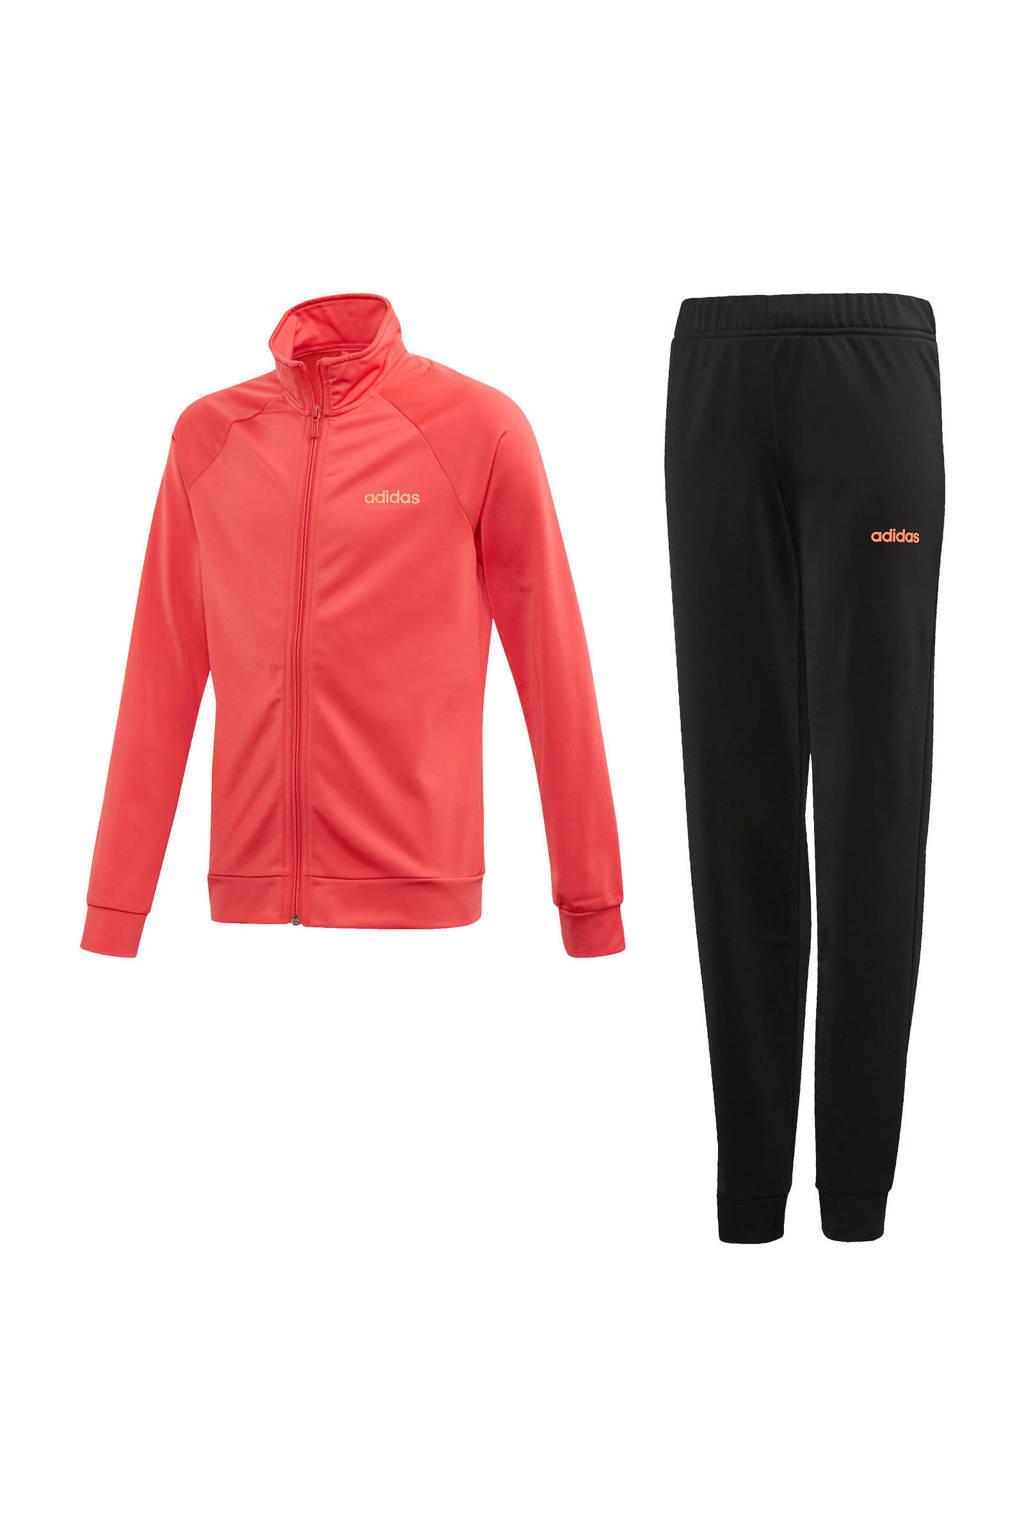 adidas trainingspak roze/zwart, Roze/zwart